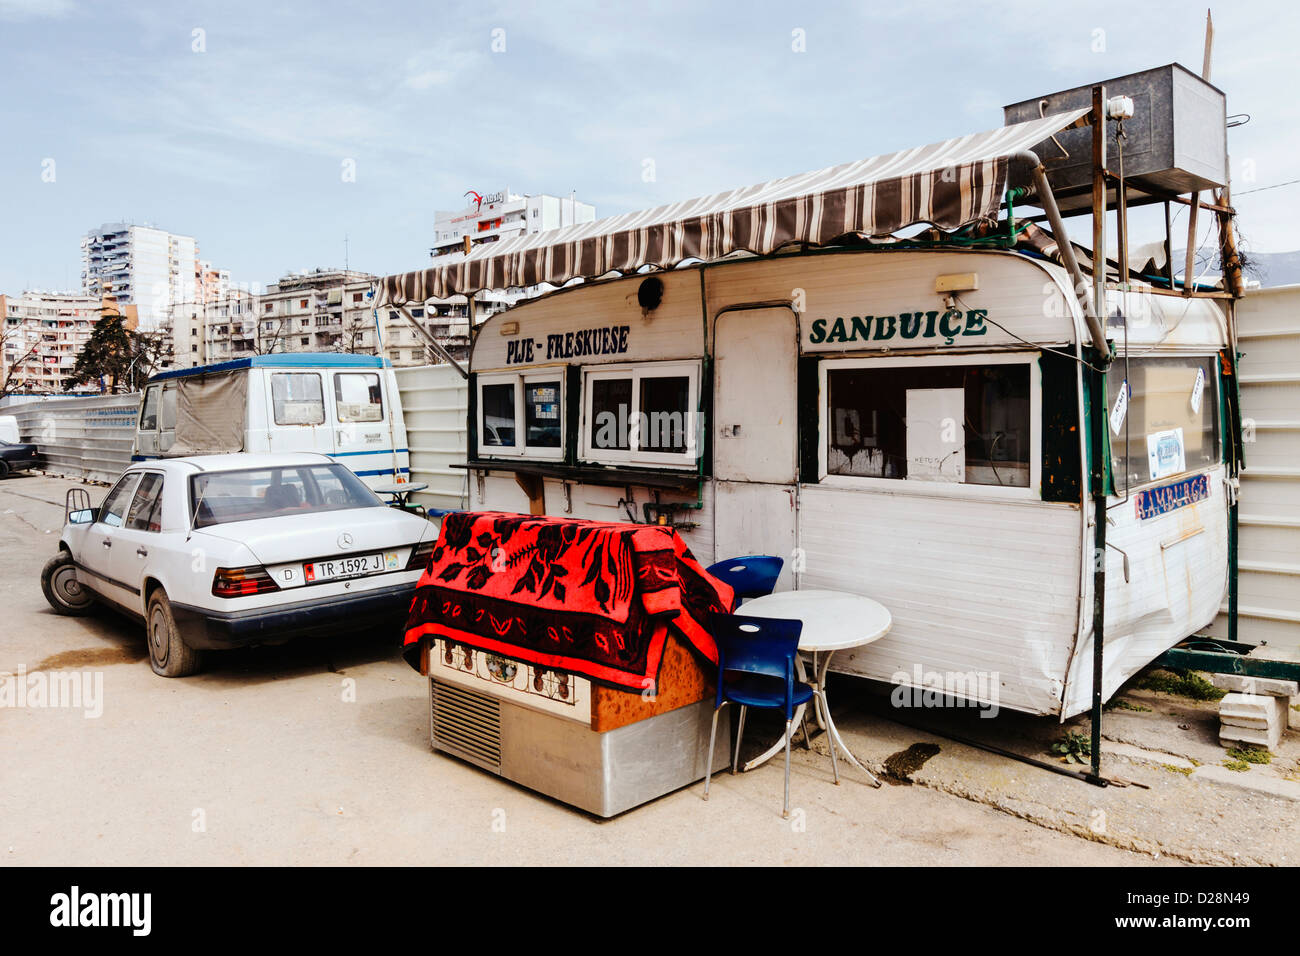 Fast food kiosk in Tirana, Albania - Stock Image